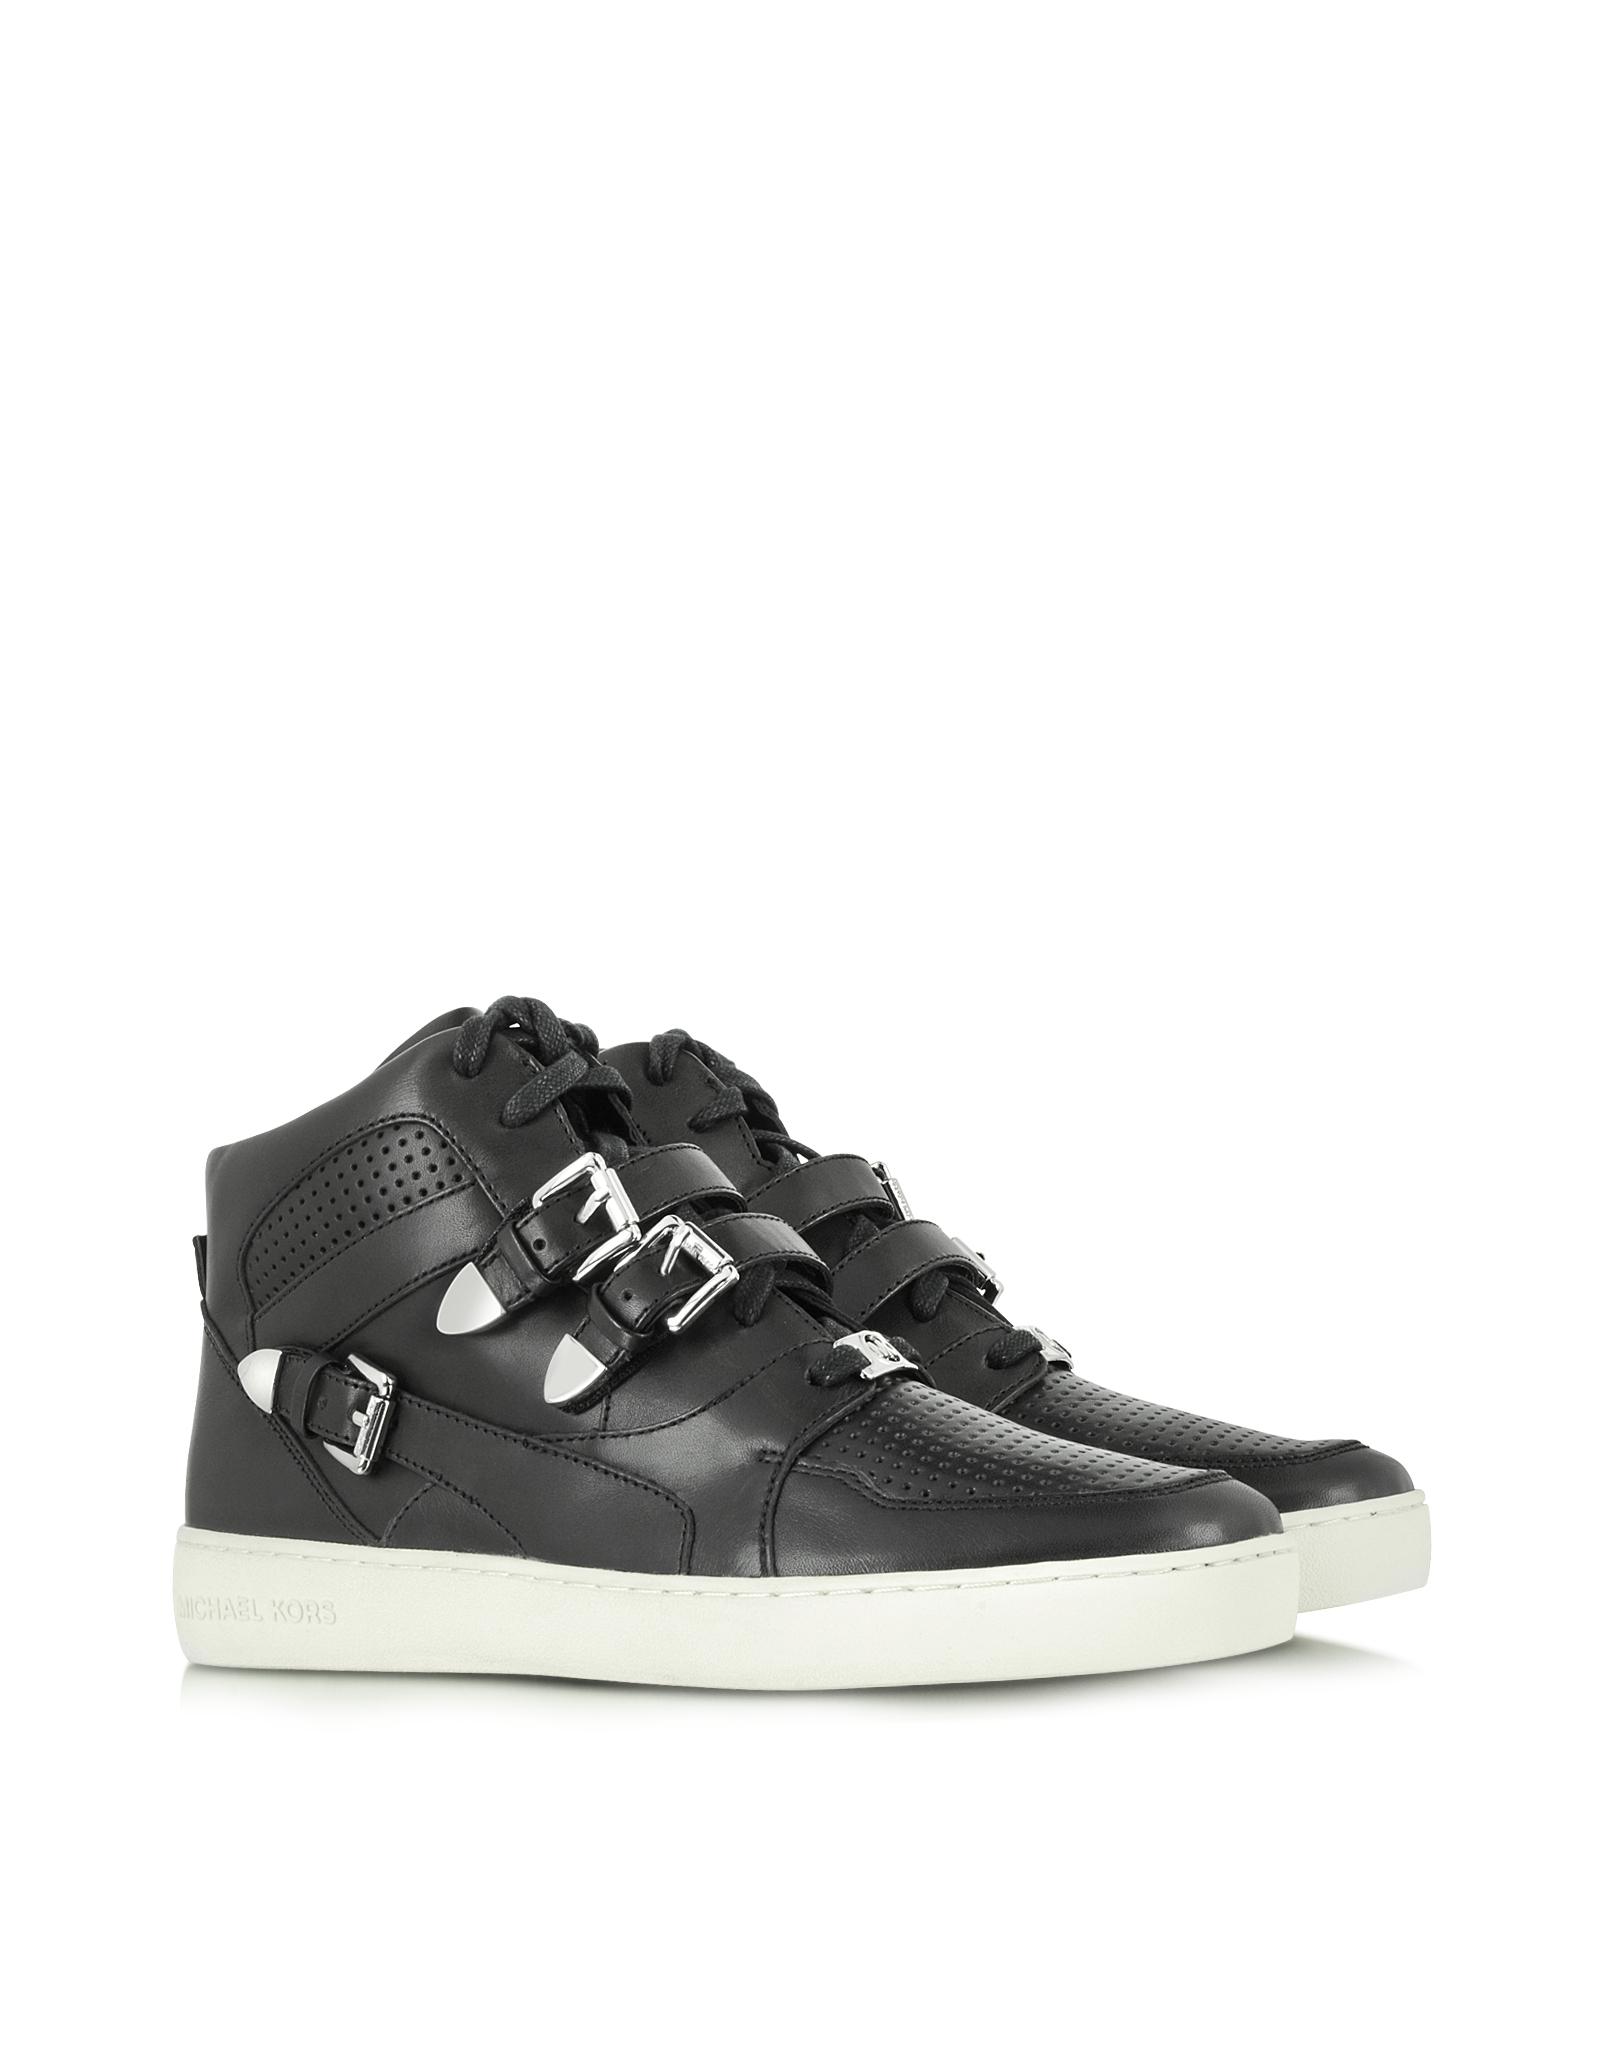 michael kors robin high top leather sneaker in black lyst. Black Bedroom Furniture Sets. Home Design Ideas